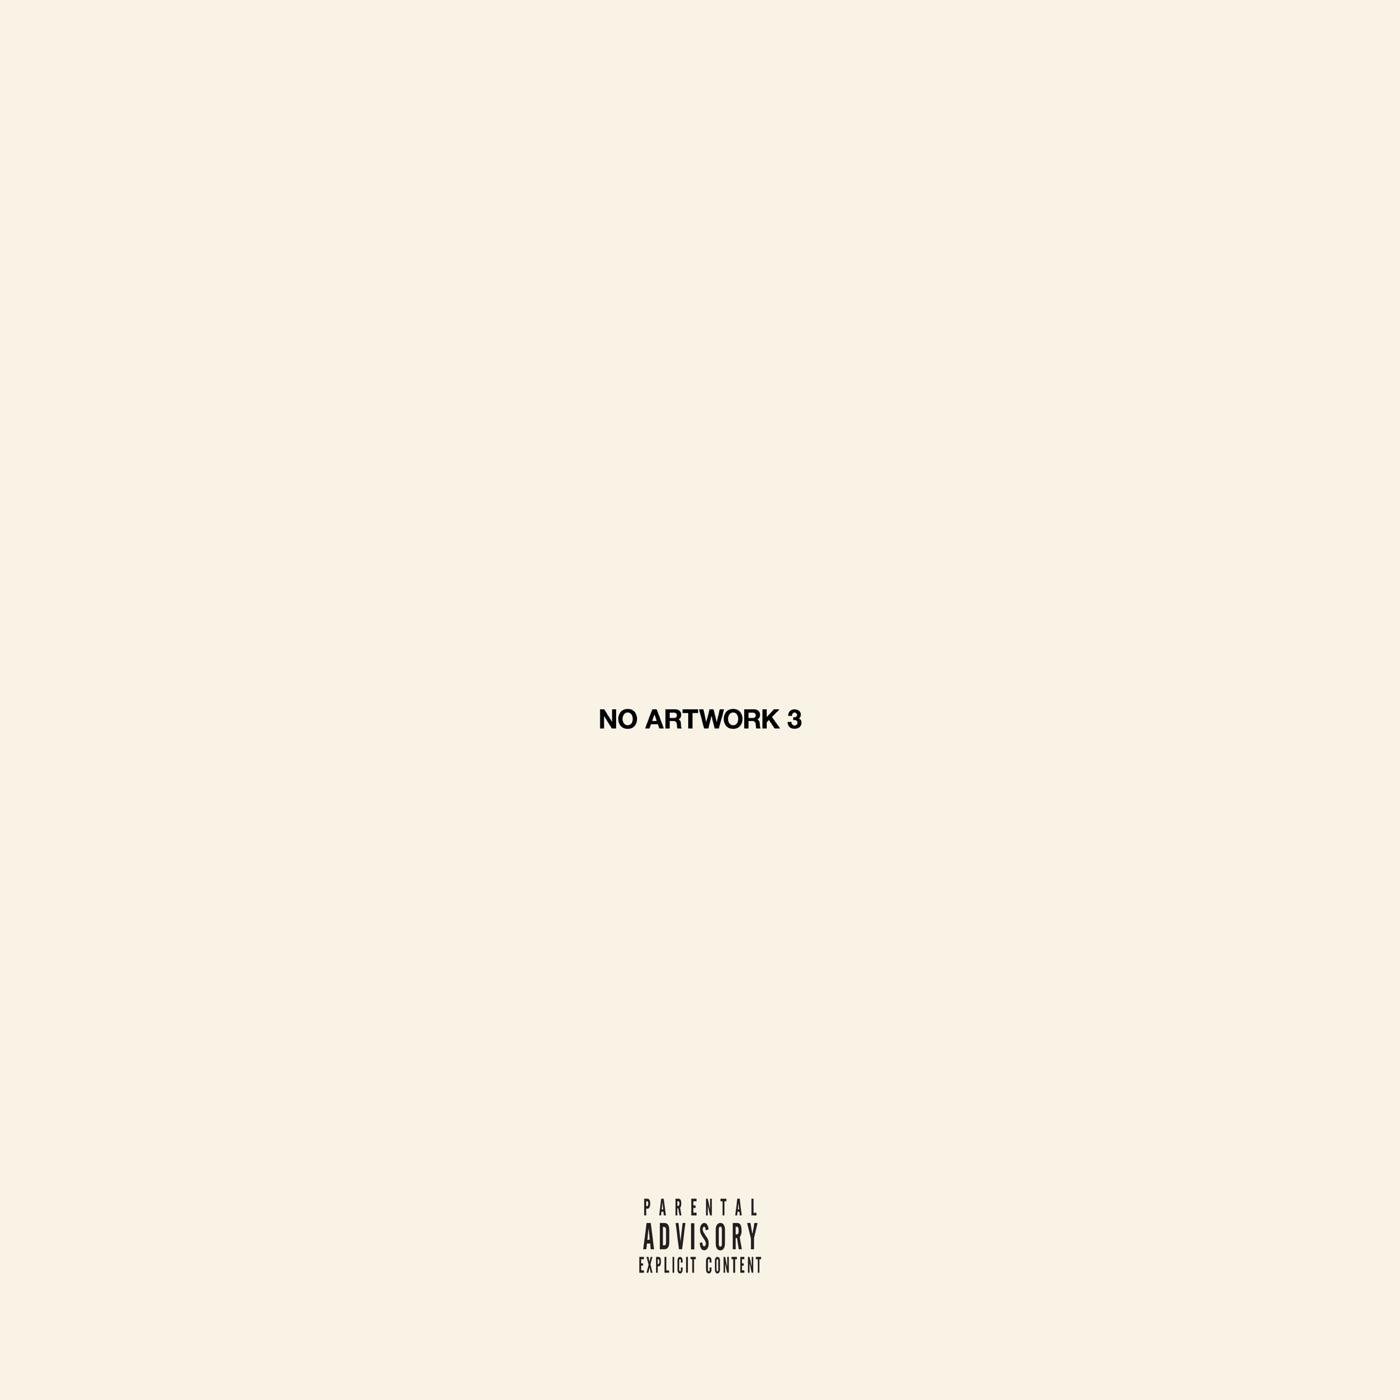 Kanye West, Gucci Mane, Big Sean, 2 Chainz, Travis Scott, Yo Gotti, Quavo & Desiigner - Champions - Single Cover